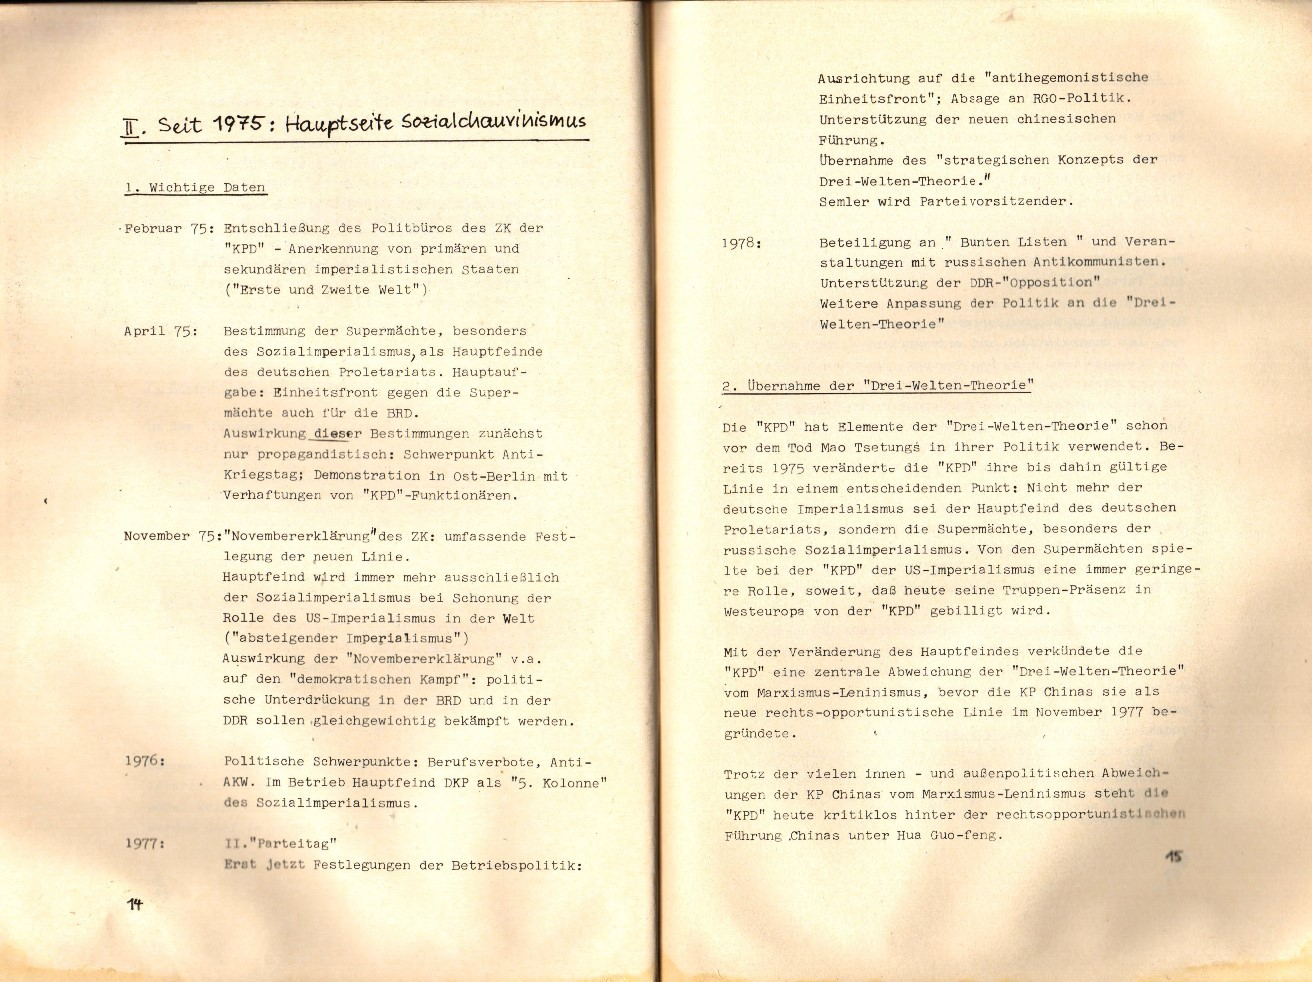 KABD_1978_Argumentationshilfen_09